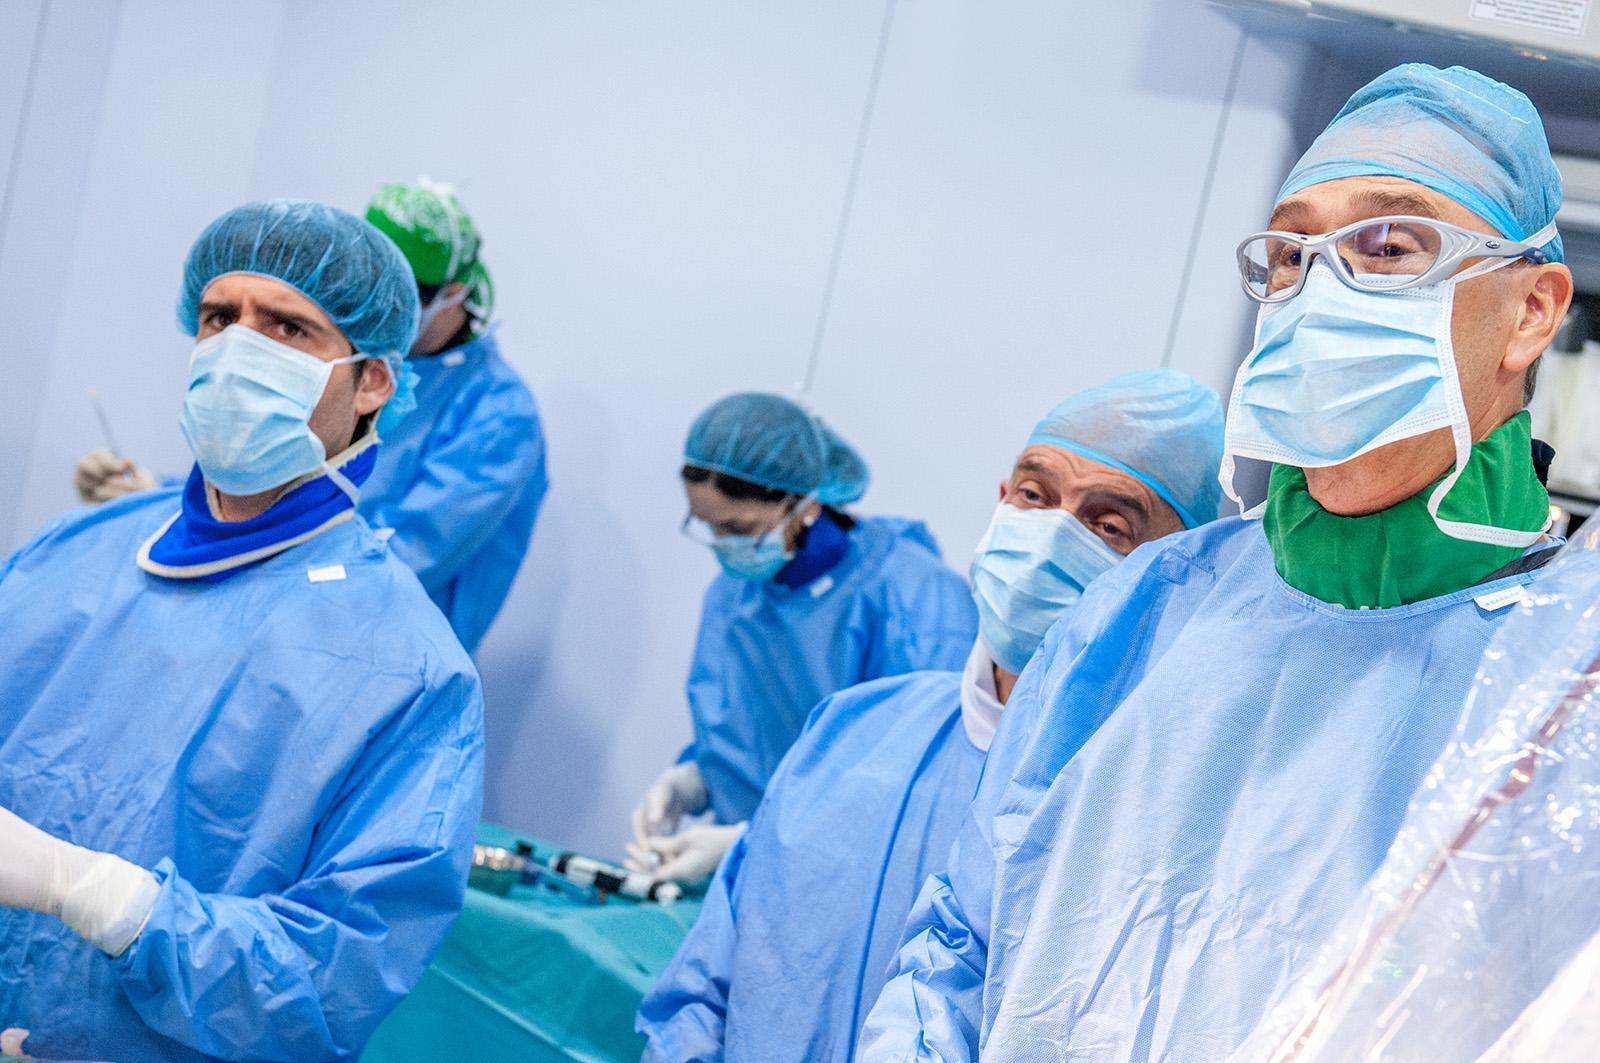 TAVI-Cardiologia-y-Hemodinamica-Clinica-Rotger-Grupo-Quironsalud